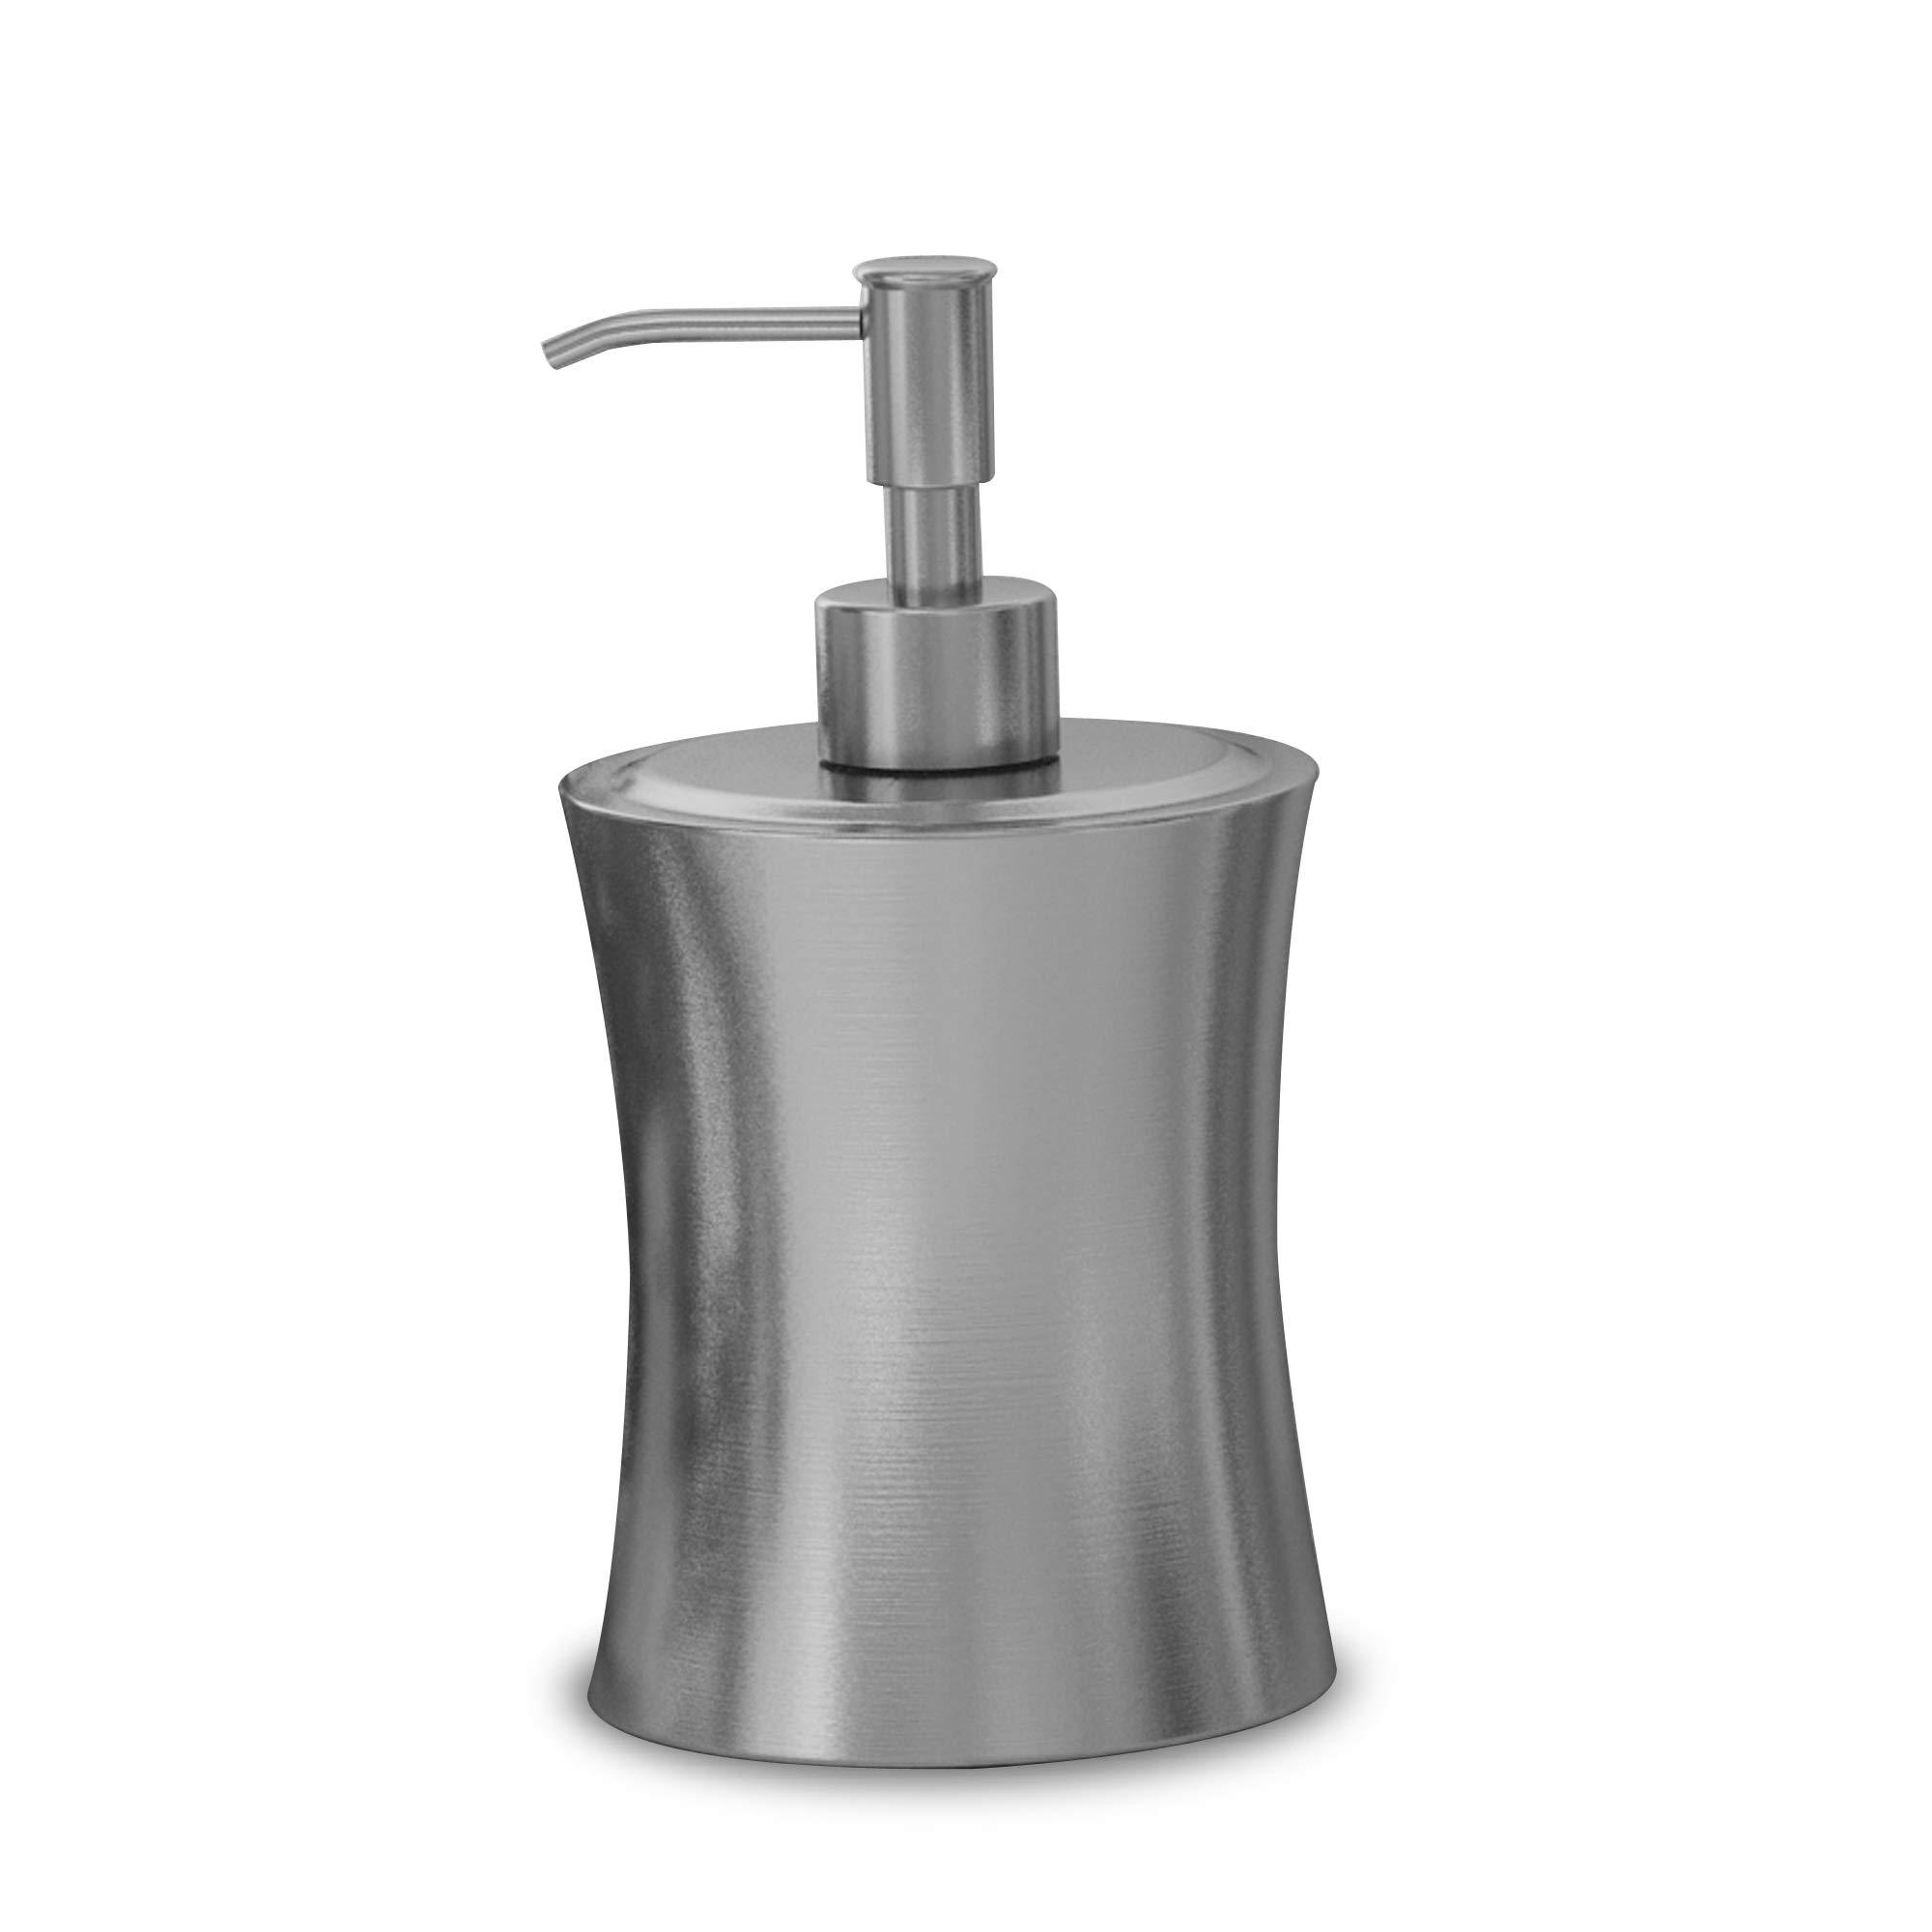 nu steel Elite Soap/Lotion Pump